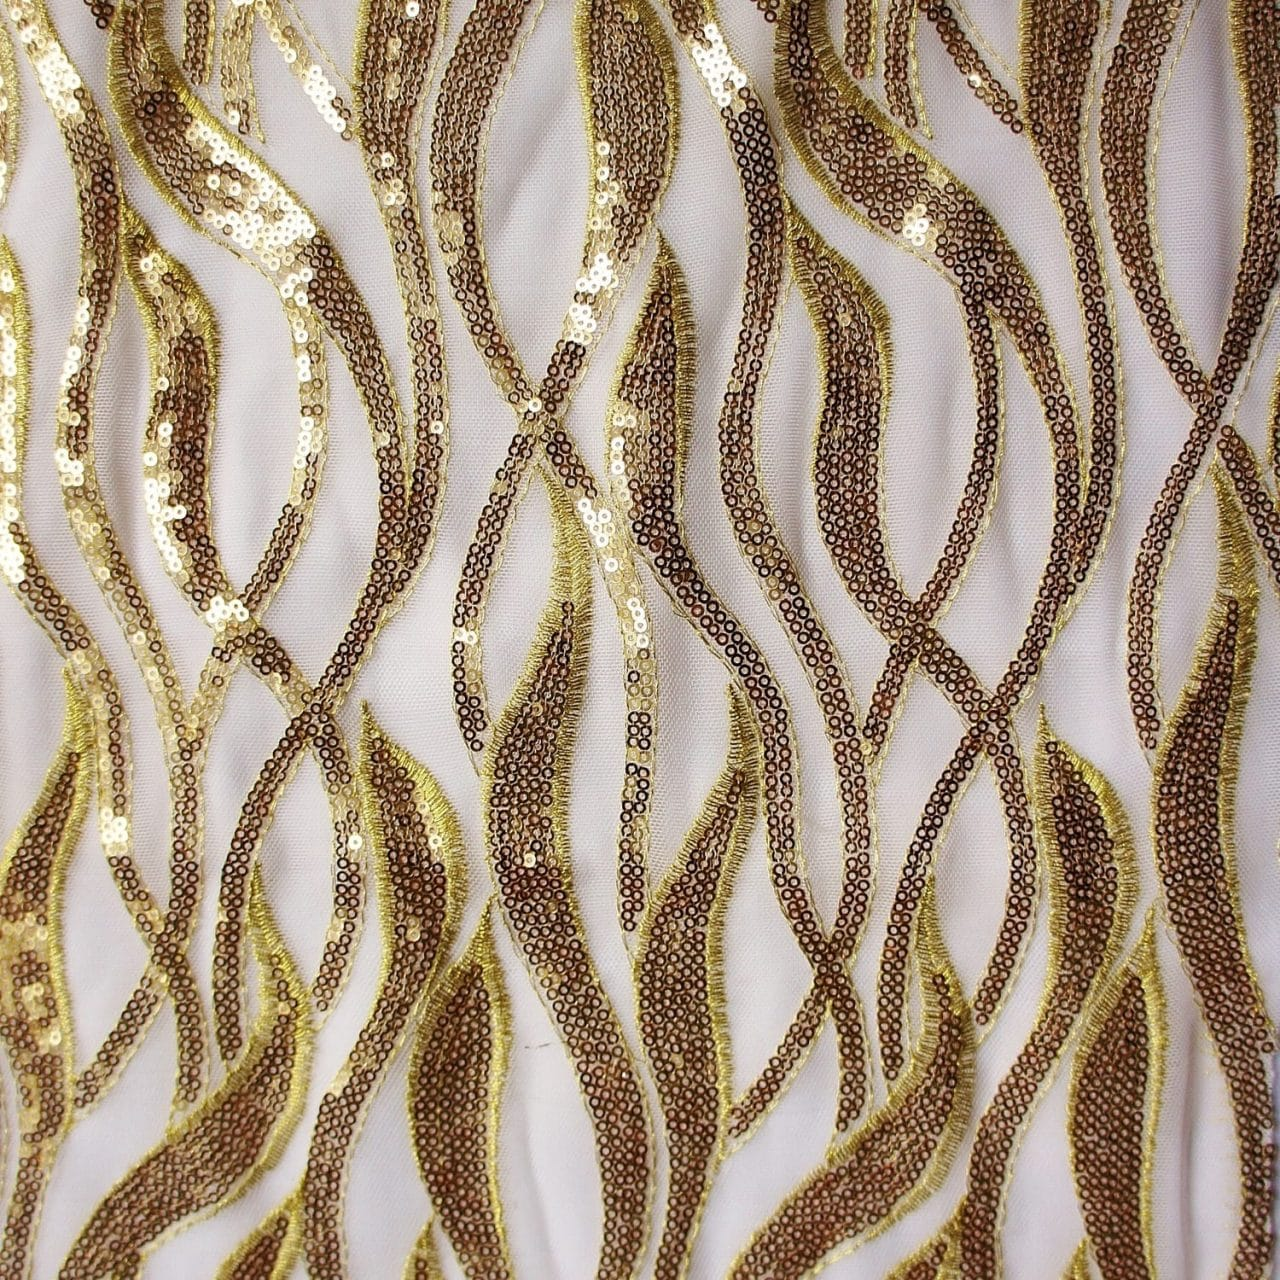 Admire Sequin Mesh – Gold / White